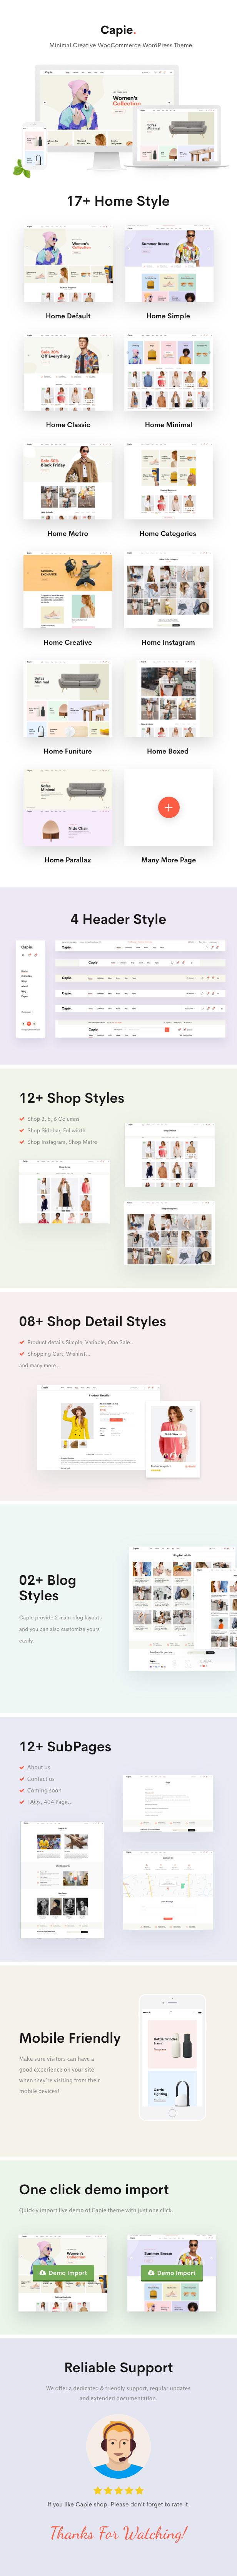 Capie - Minimal Creative WooCommerce WordPress Theme - 4